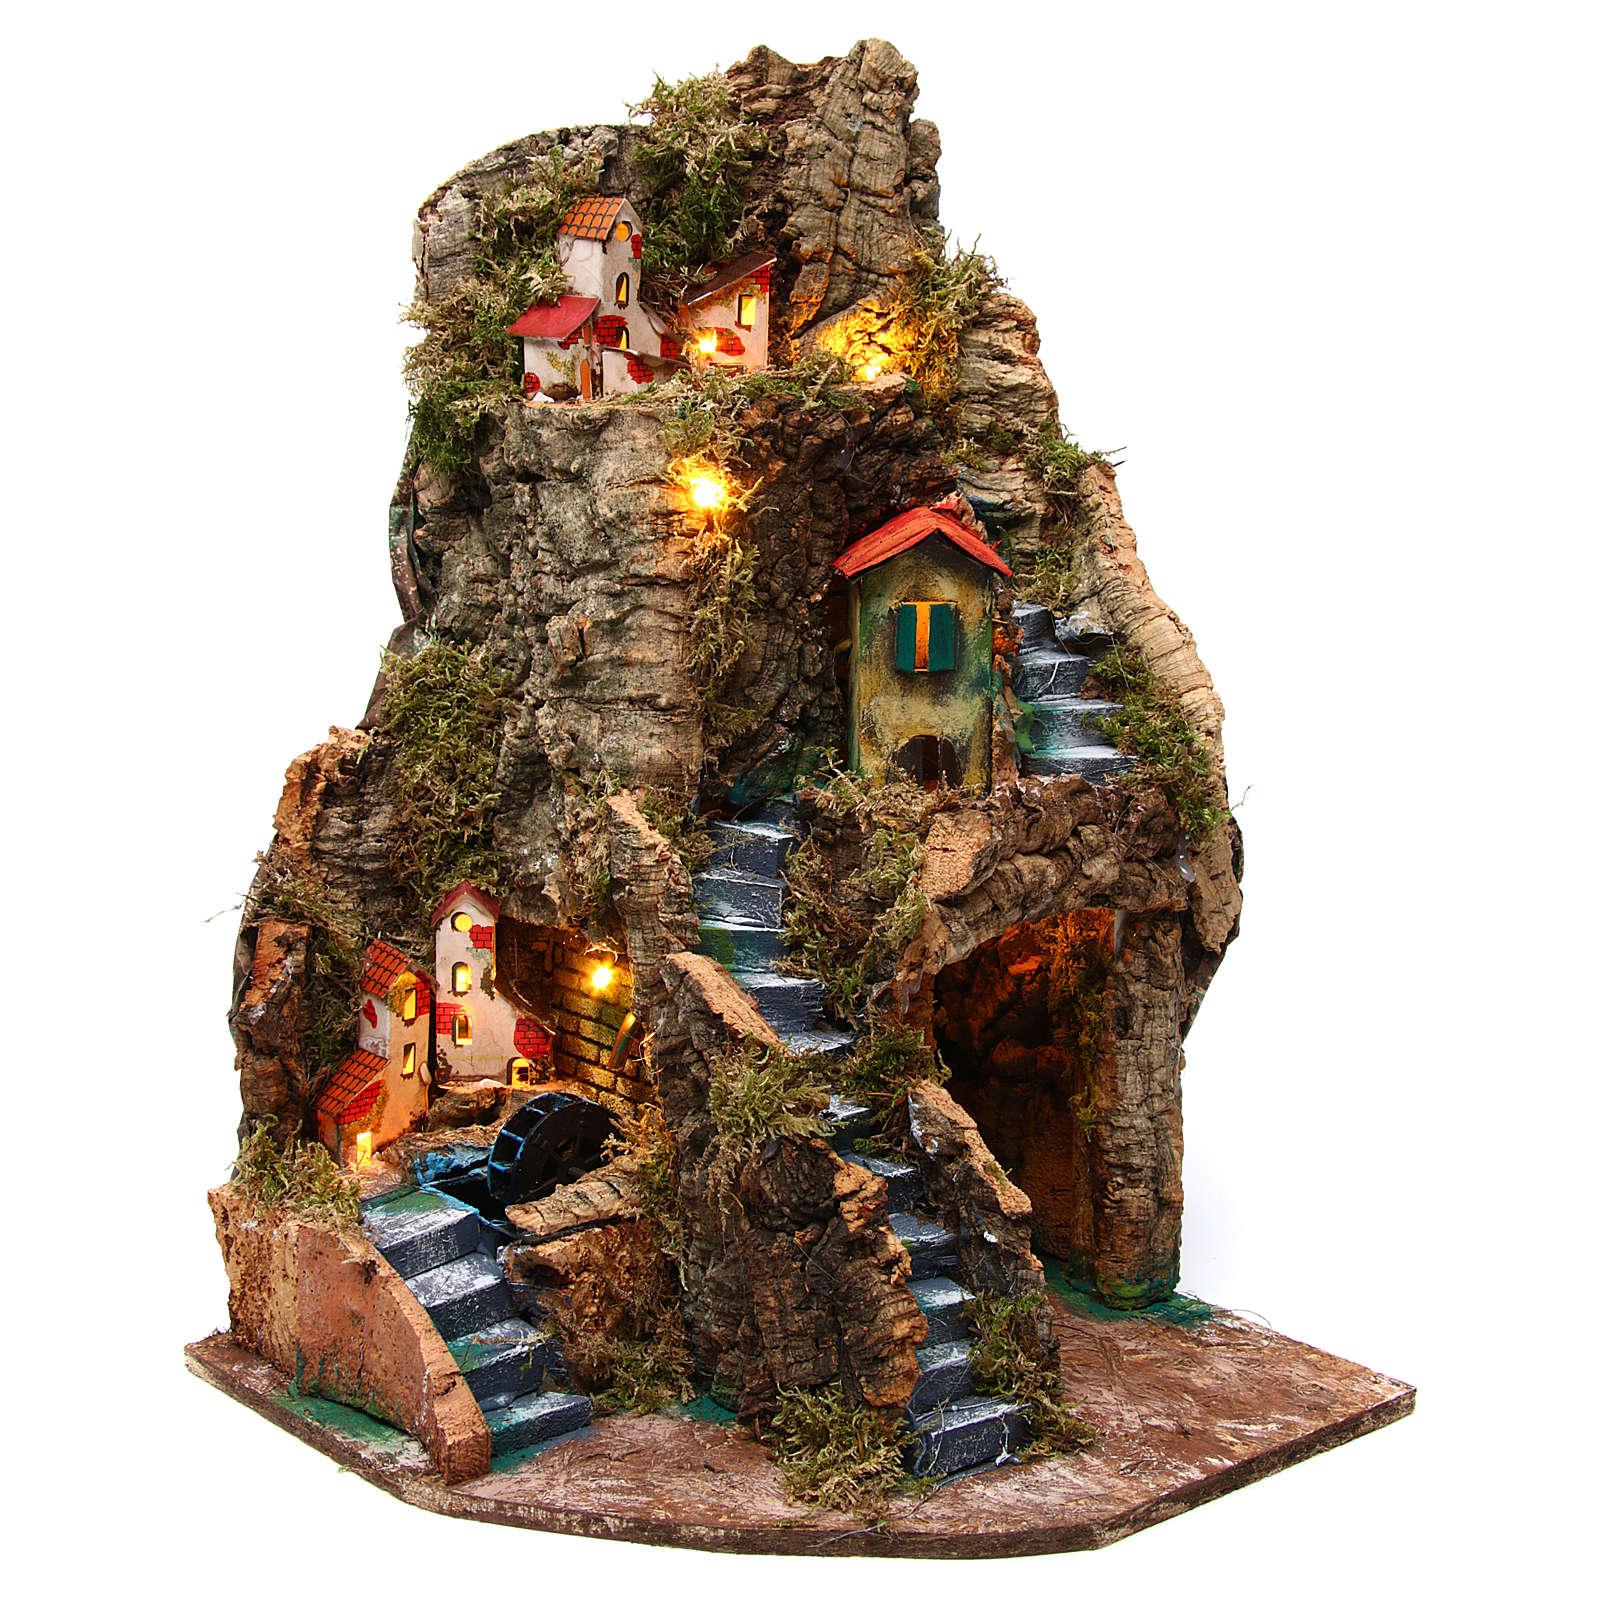 Village with watermill 30x30x45 cm for Nativity Scene 6-8 cm 4